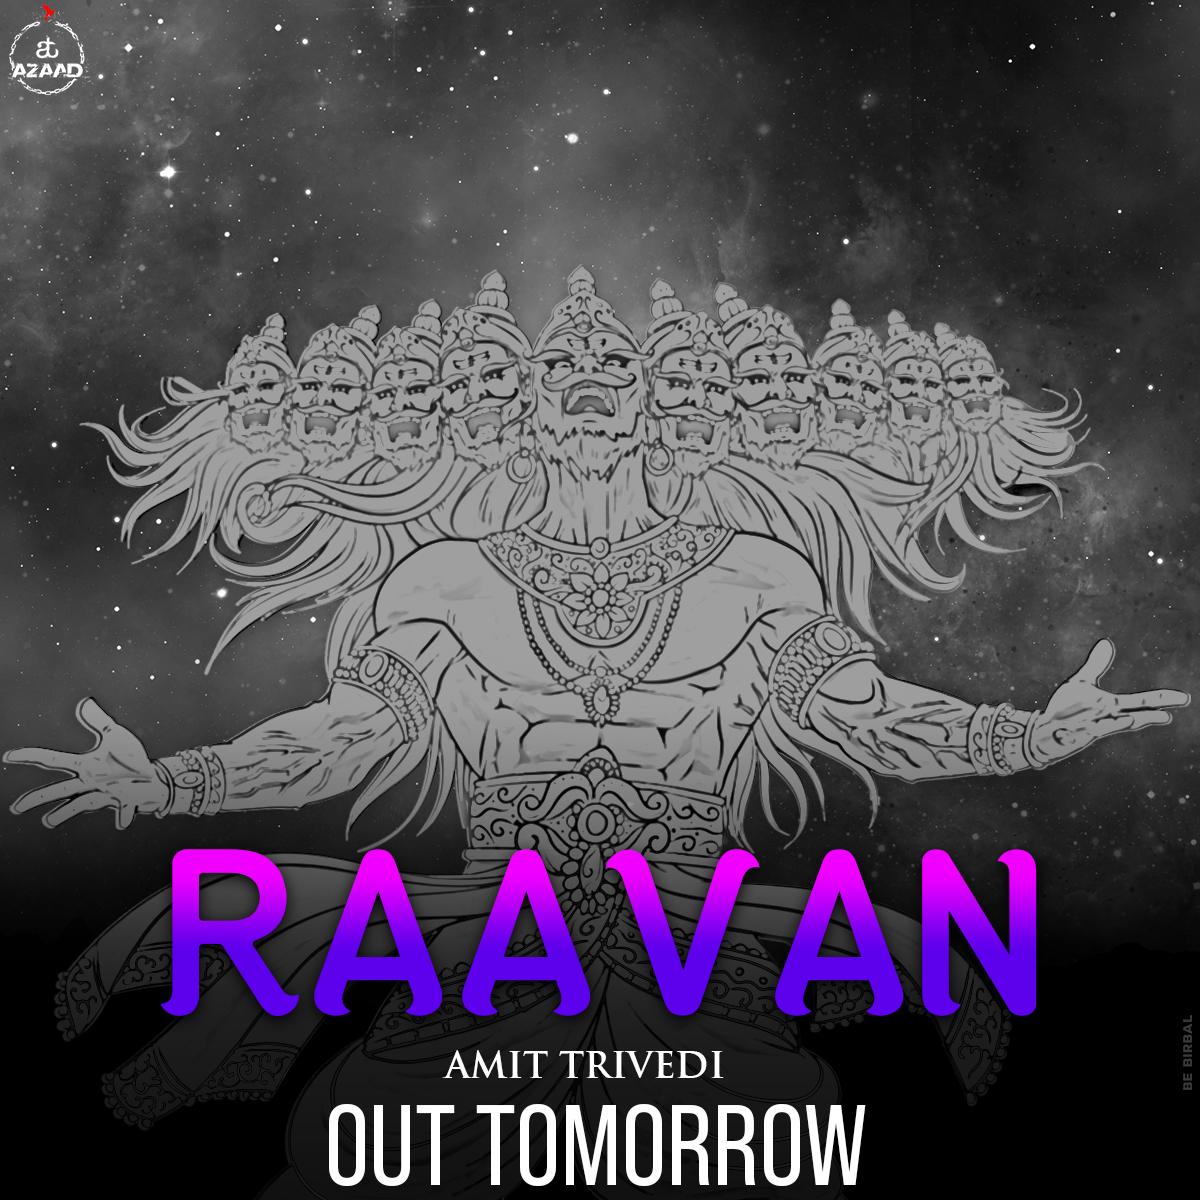 Raavan is ready to meet you all tomorrow. Get ready for a musical Dussehra! Set the reminder here- https://t.co/bxZ2wTA9Fa  #Raavan #SongsofTrance #TranceMusic #AmitTrivedi #AmitTrivediMusic #ATAzaad https://t.co/etfxgHNzvg